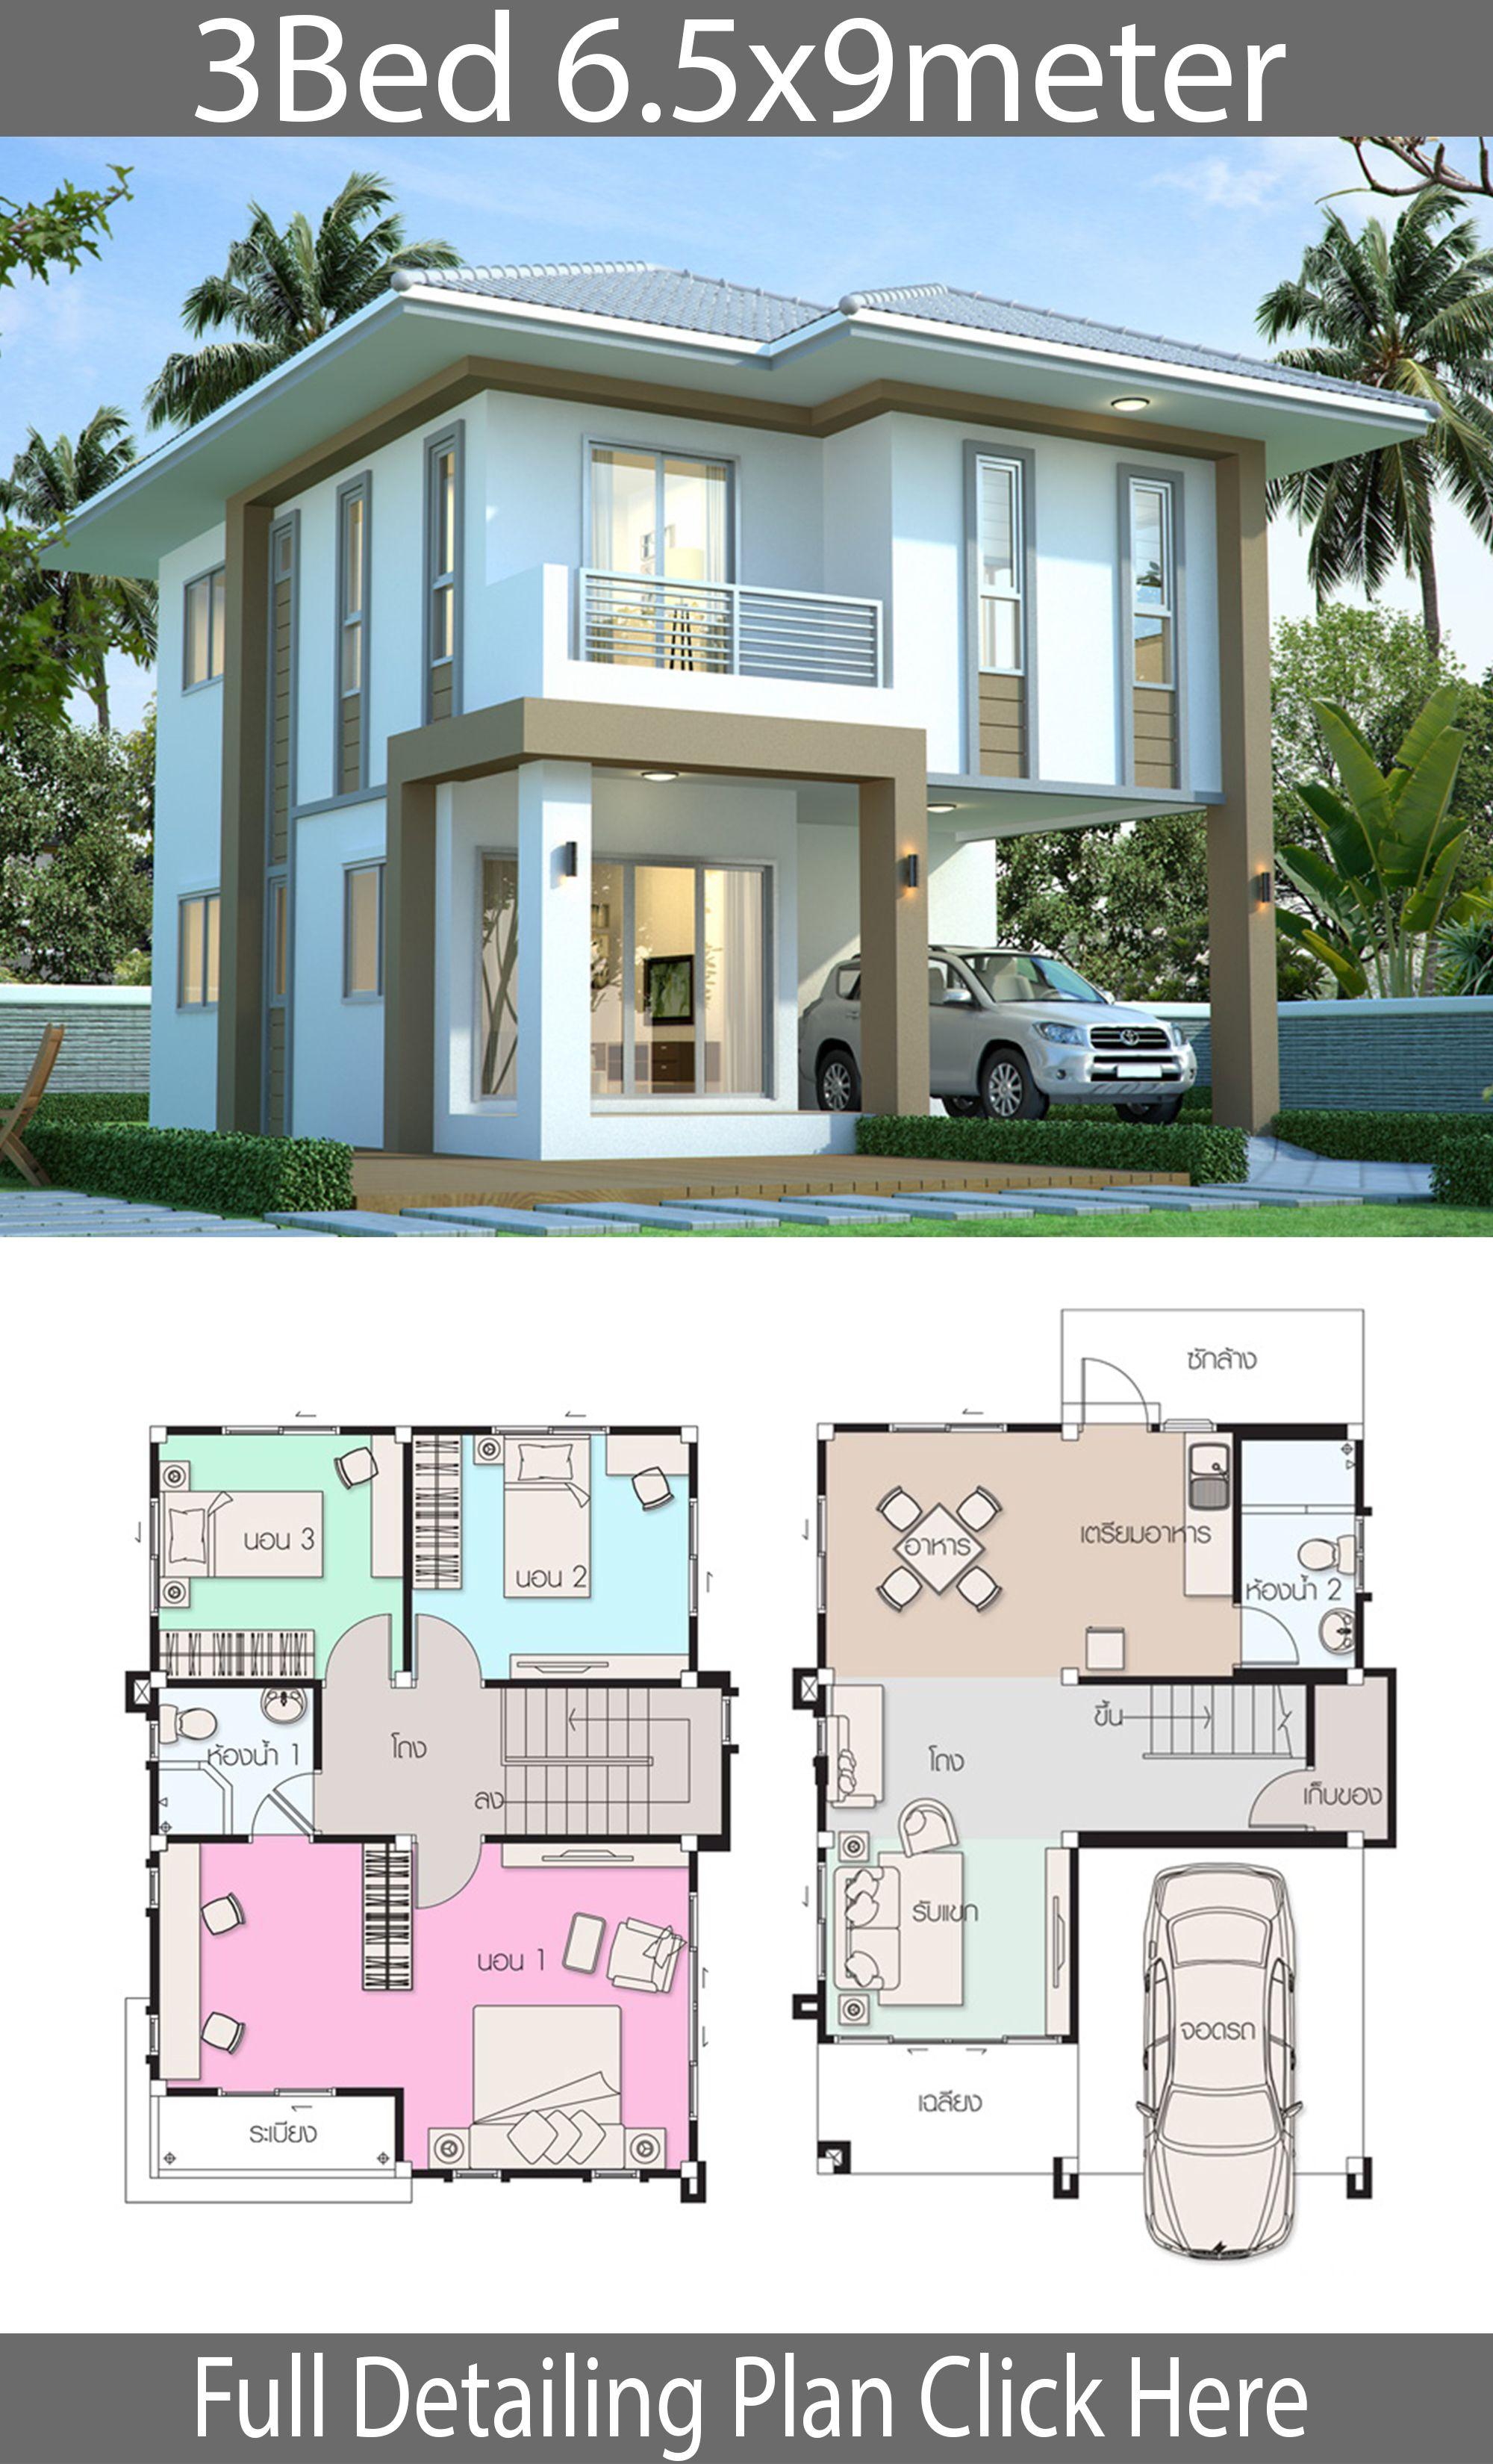 House Design Plan 6 5x9m With 3 Bedrooms House Idea House Designs Exterior House Construction Plan Model House Plan